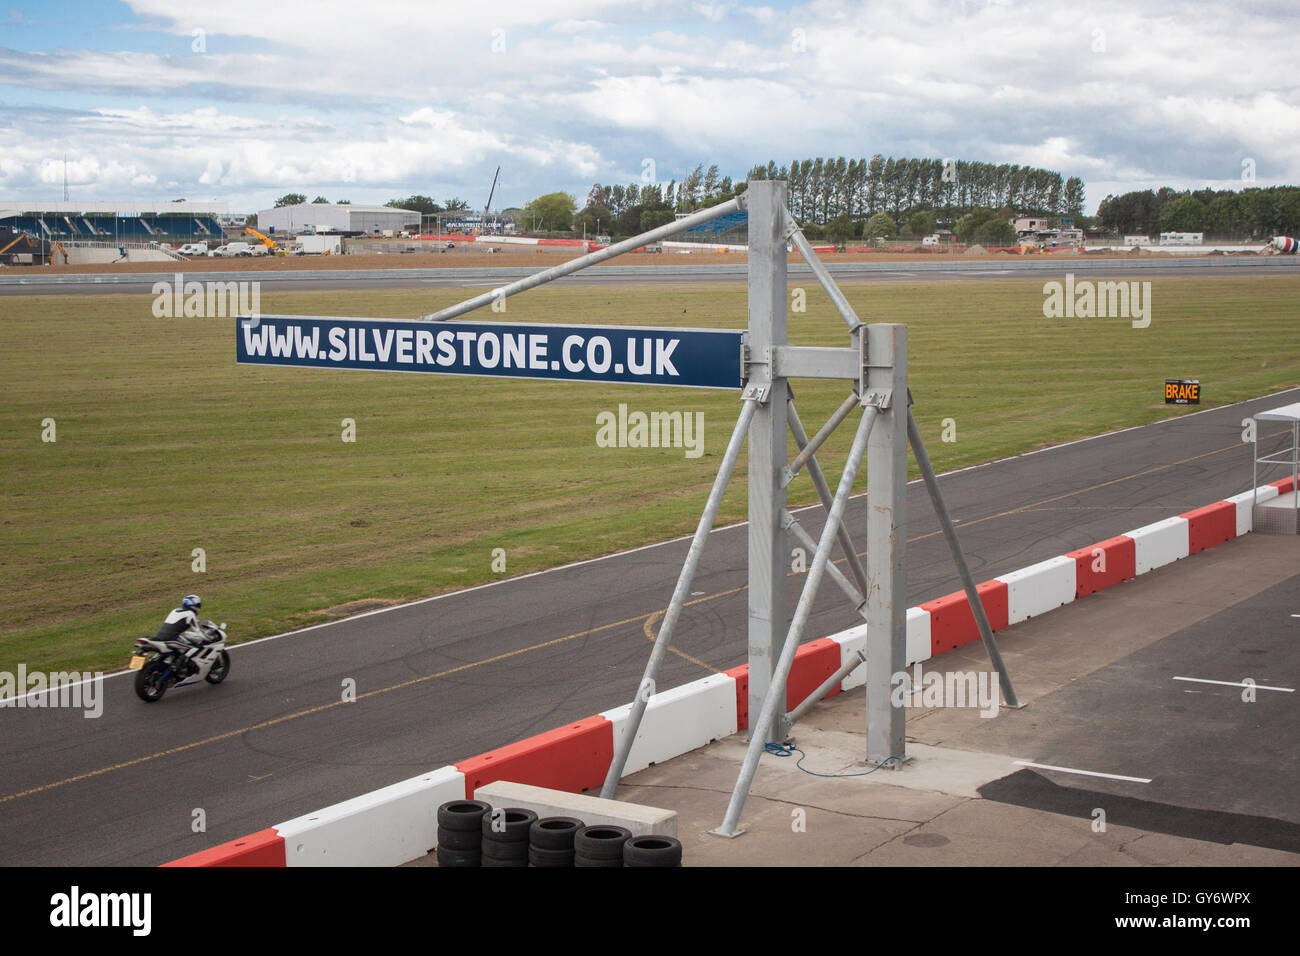 Silverstone Circuit Stock Photos & Silverstone Circuit Stock Images ...